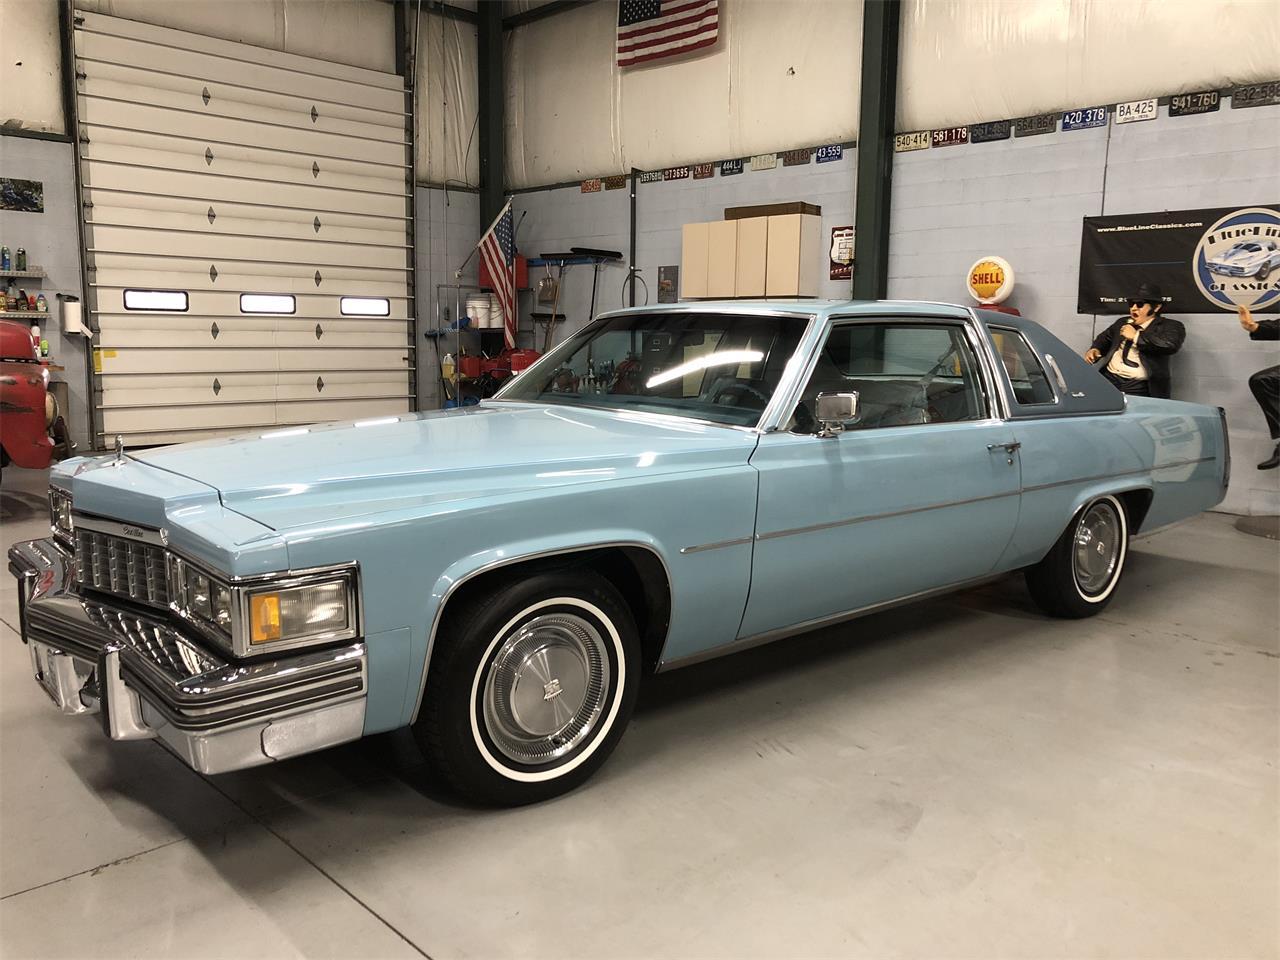 1977 Cadillac Coupe DeVille for Sale | ClassicCars.com ...